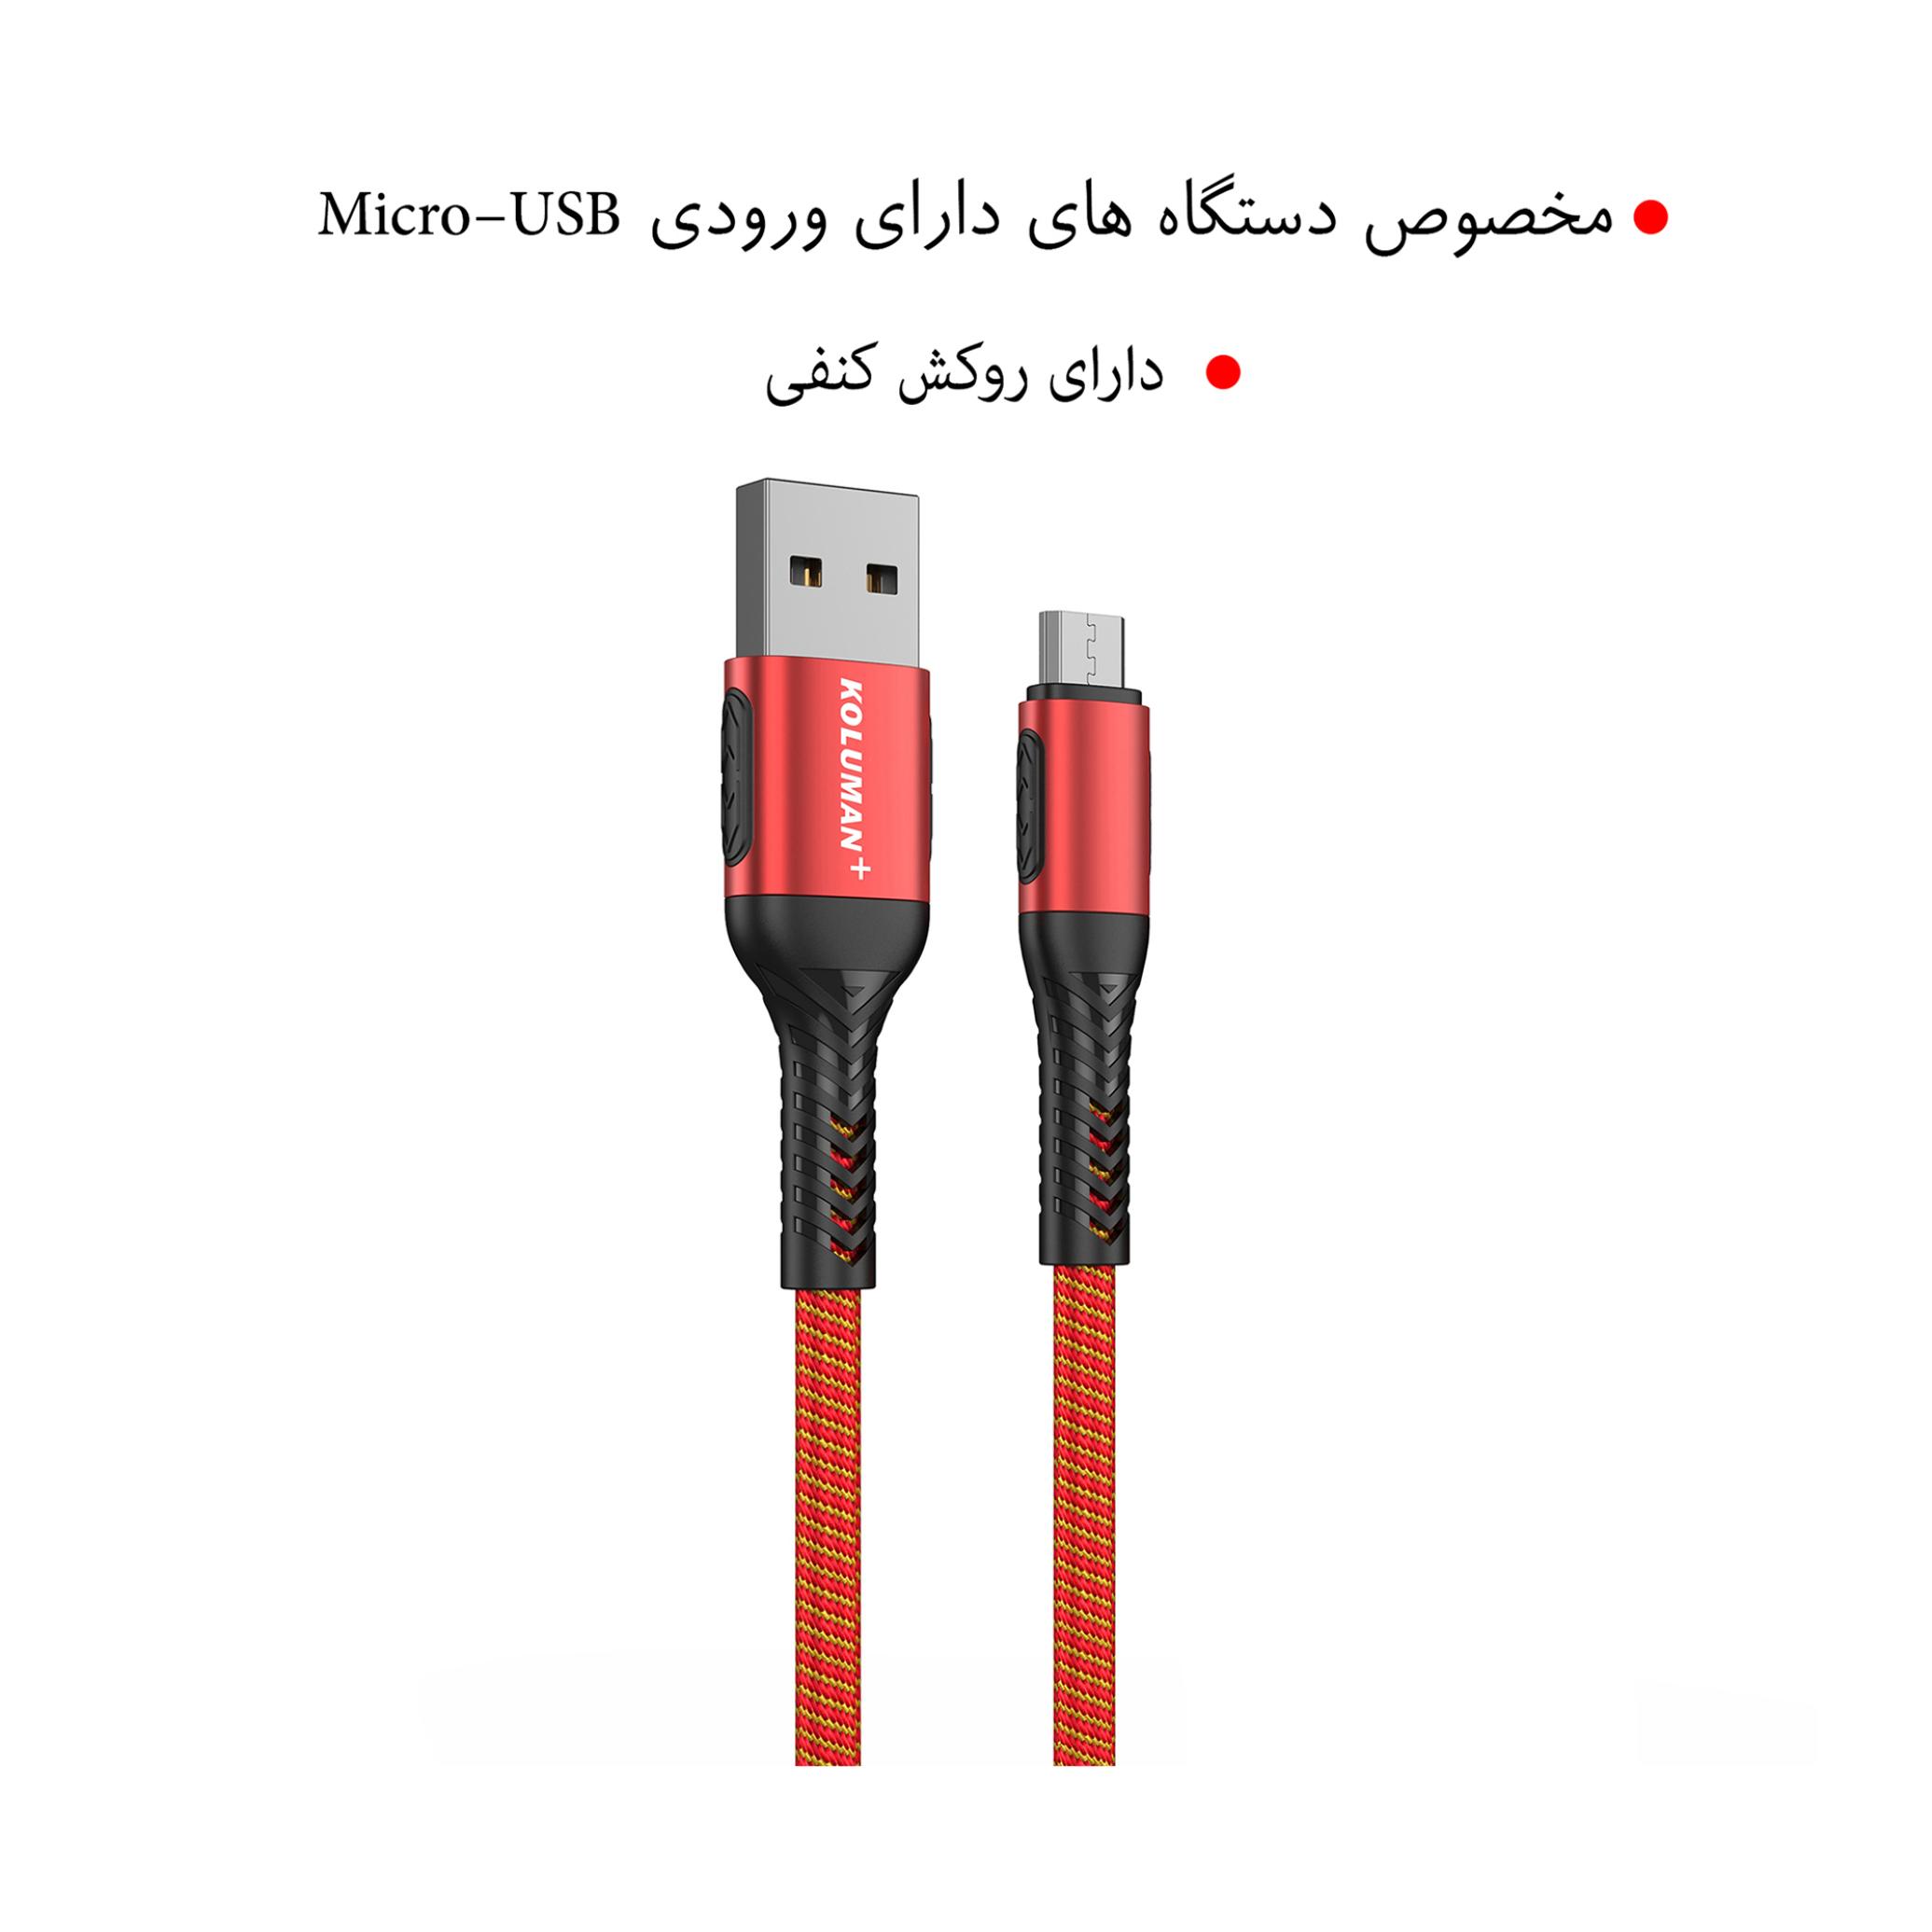 کابل تبدیل USB به microUSB کلومن پلاس مدل K9+